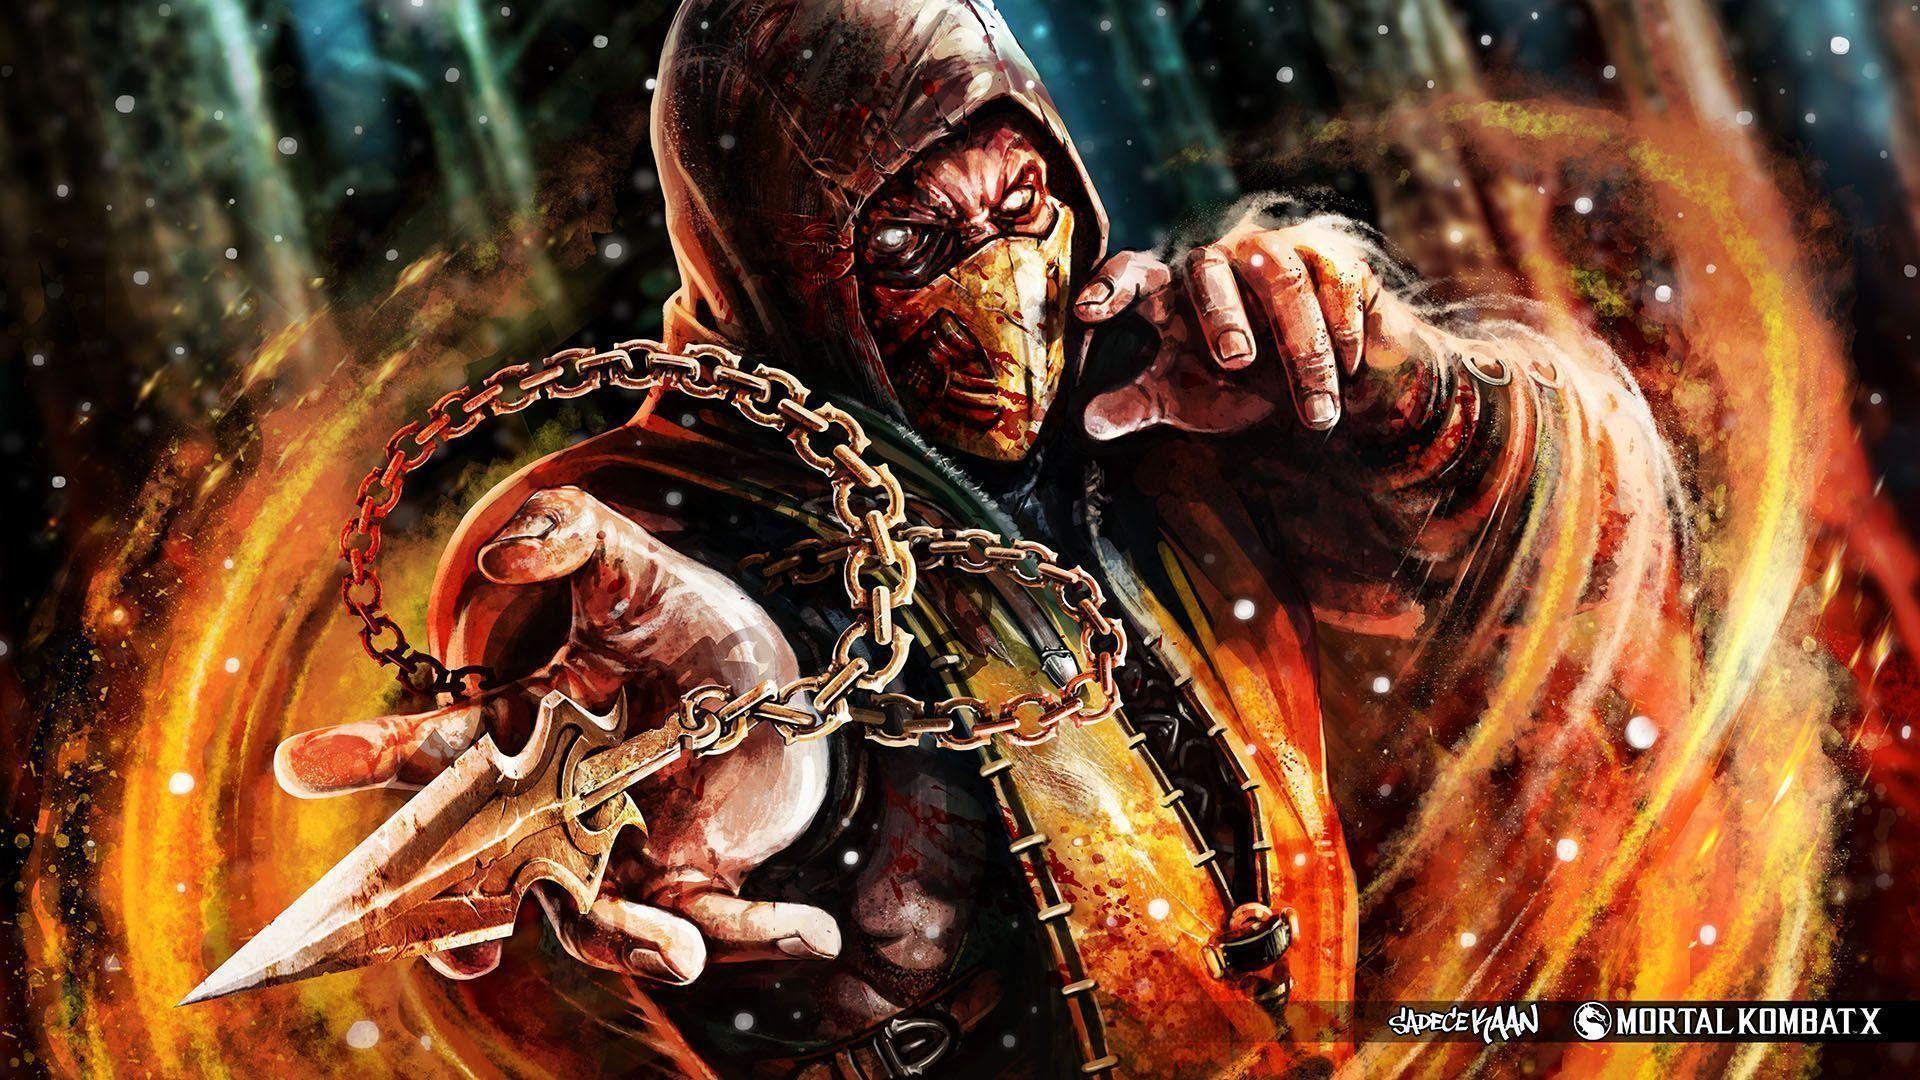 Mortal Kombat X Wallpaper Scorpion Fanart SadeceKAAN from Turkey